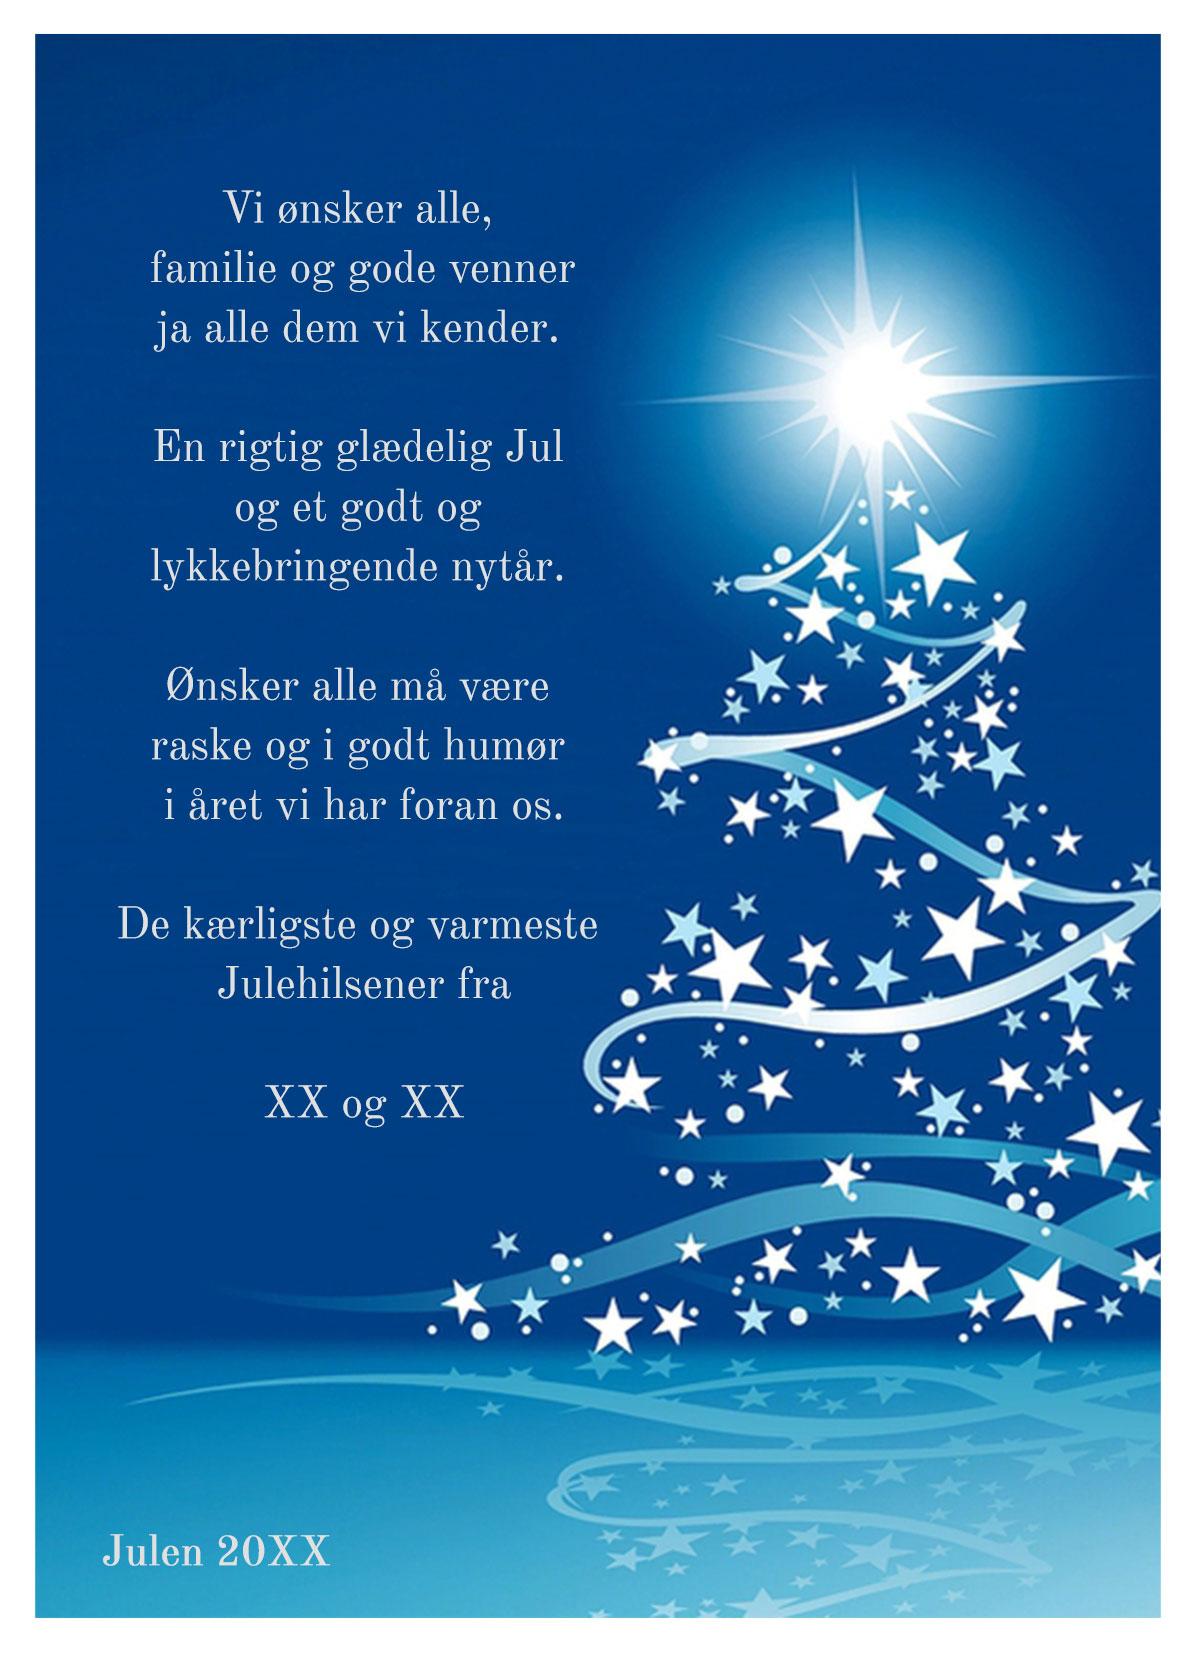 Julekort med musik og sang nr 4